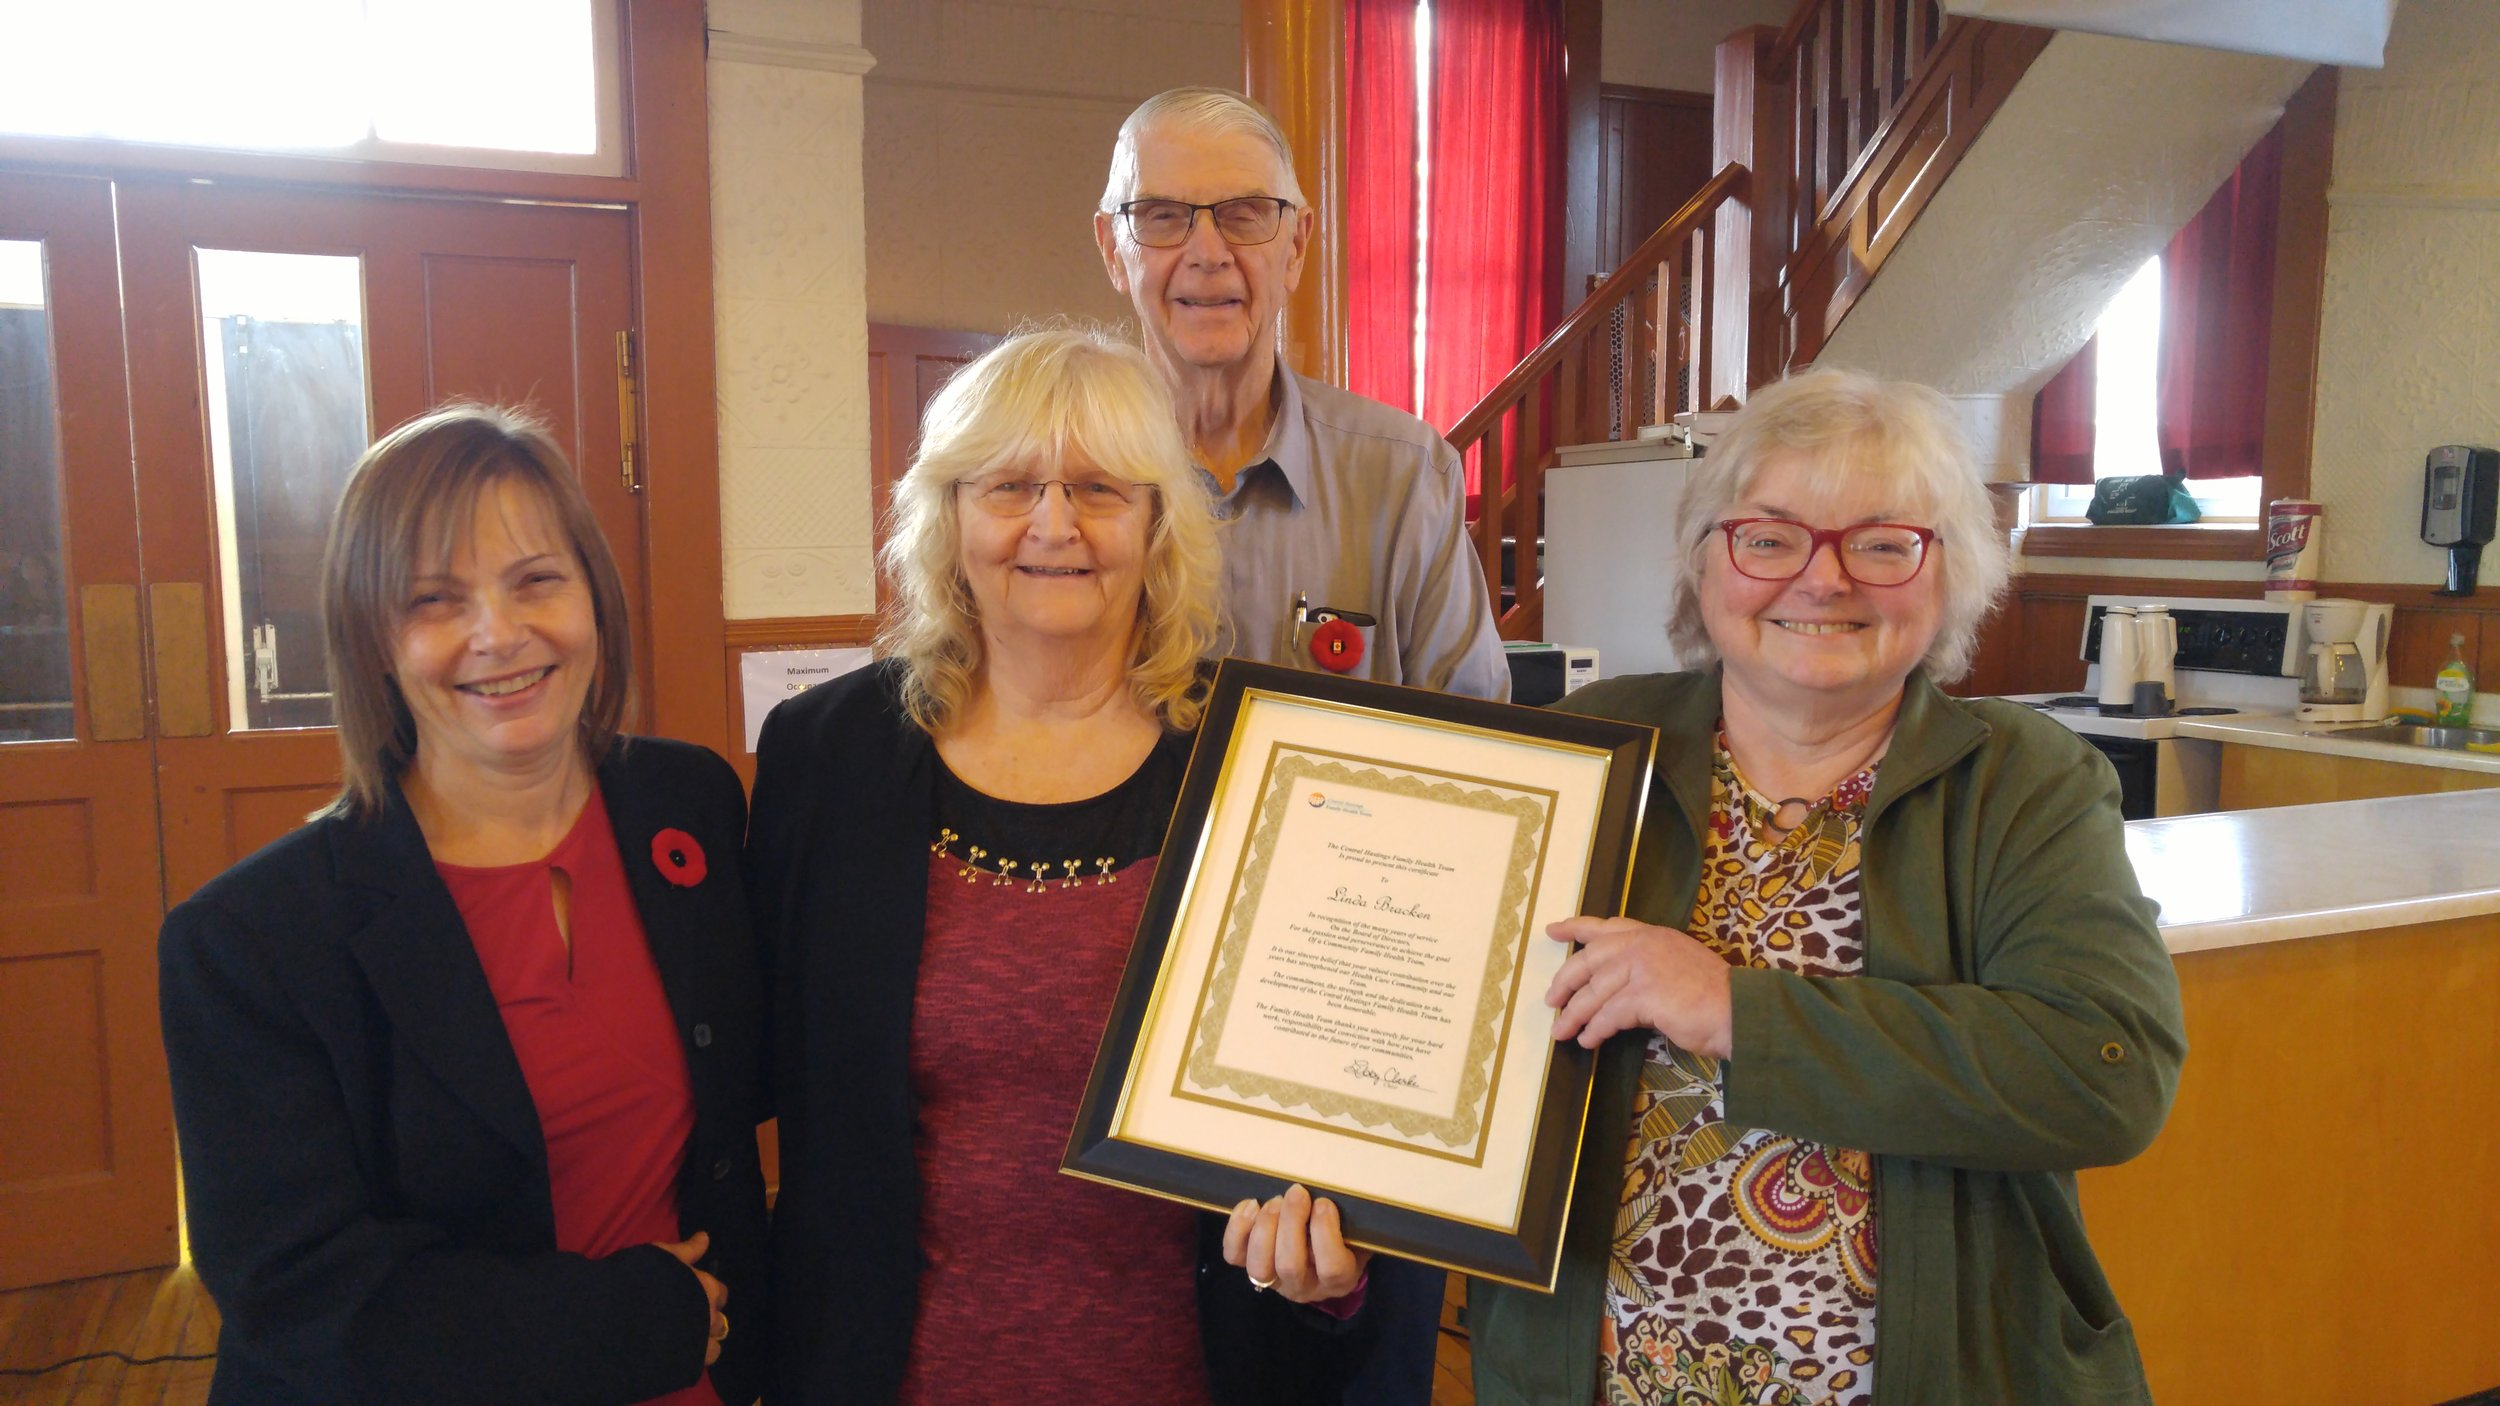 Linda receiving award.